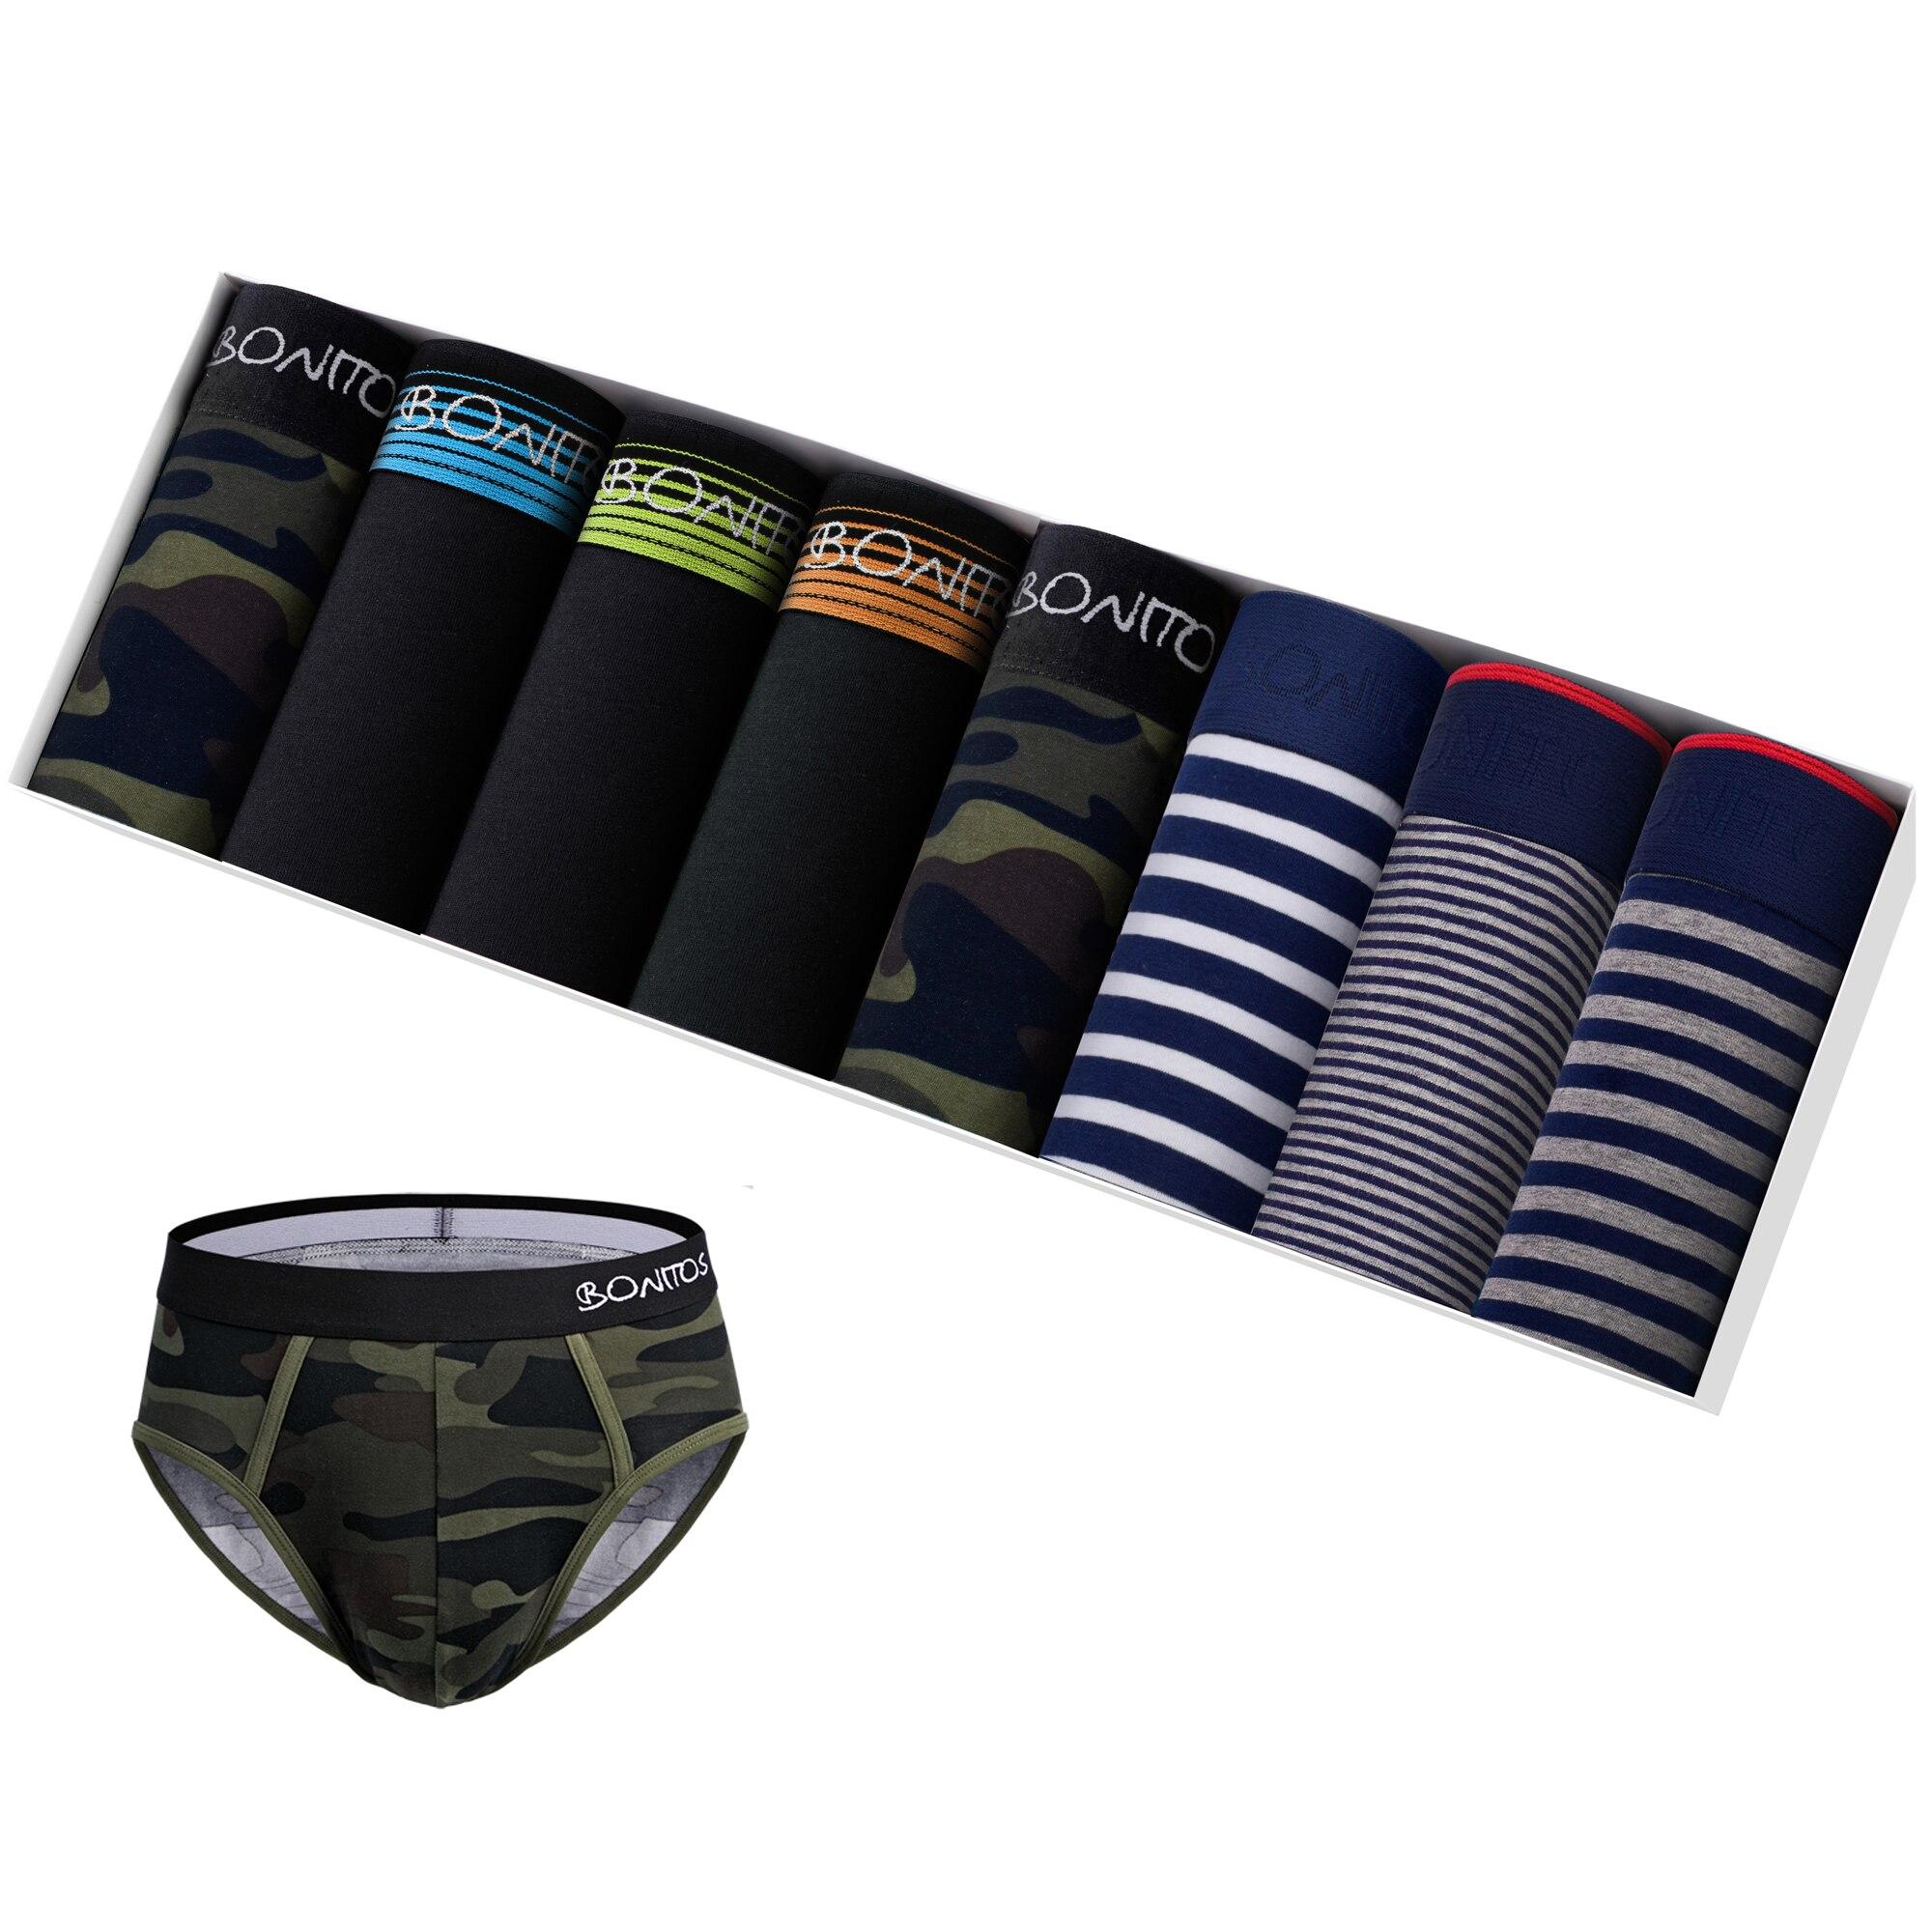 8 pçs conjunto de roupa interior cuecas masculinas tanga calcinha masculina shorts de alta qualidade bikini homme underware boxershorts calson deslizamento